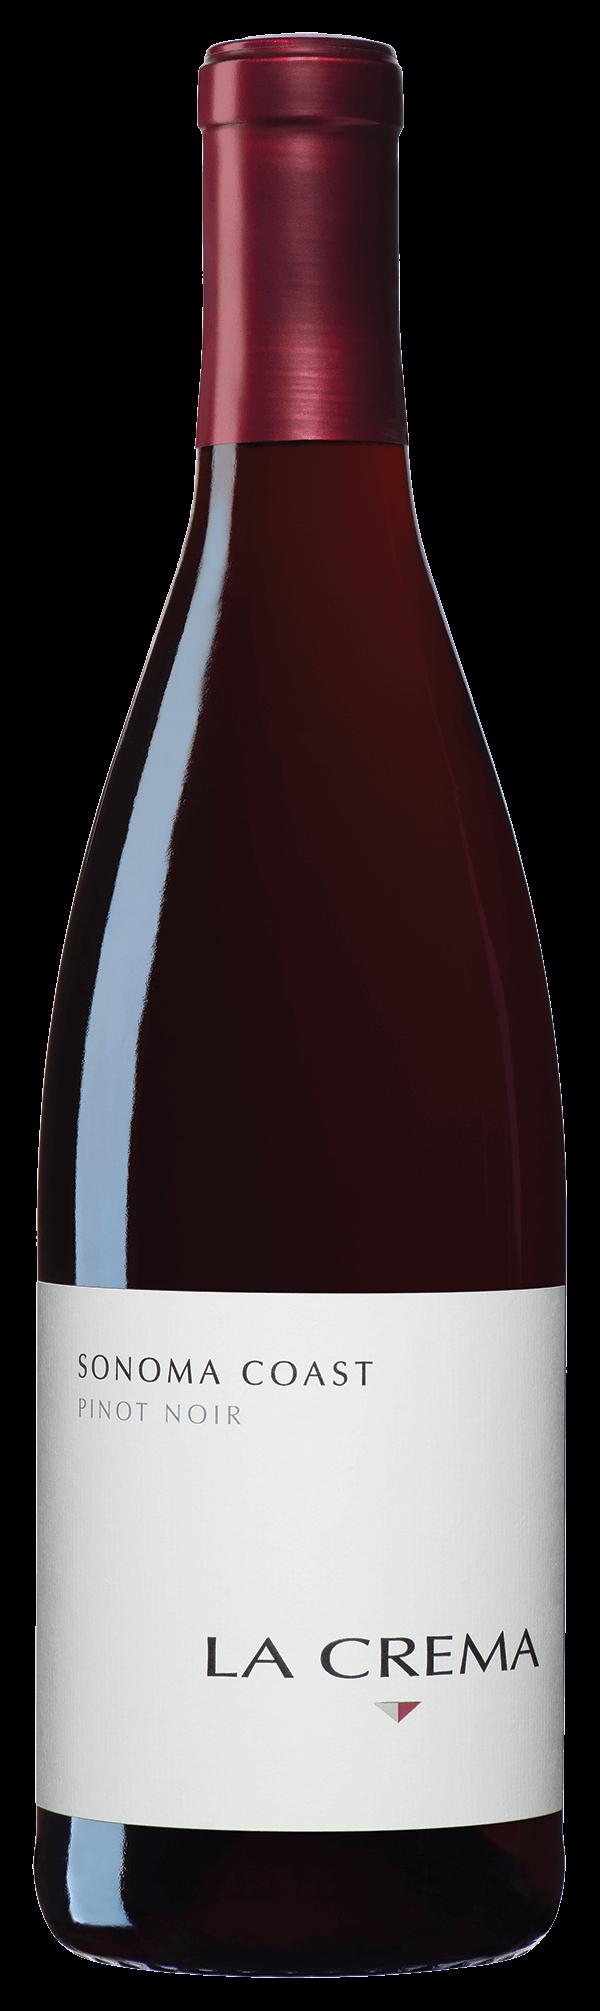 2019 Sonoma Coast Pinot Noir